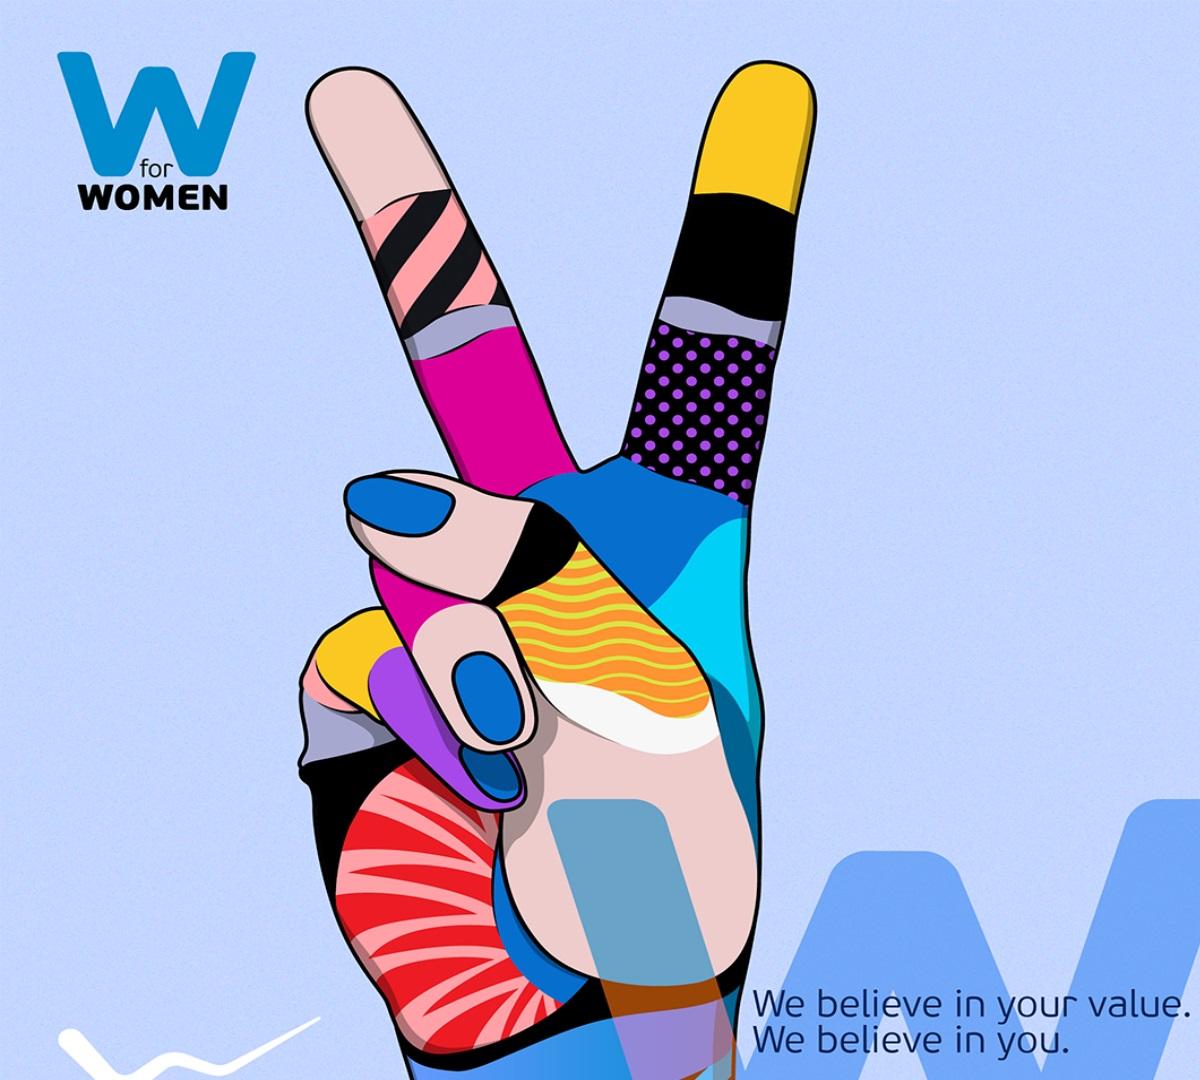 Wind Ελλάς: Δέσμευση για κάλυψη του 35% των θέσεων ευθύνης από γυναίκες μέχρι το 2025